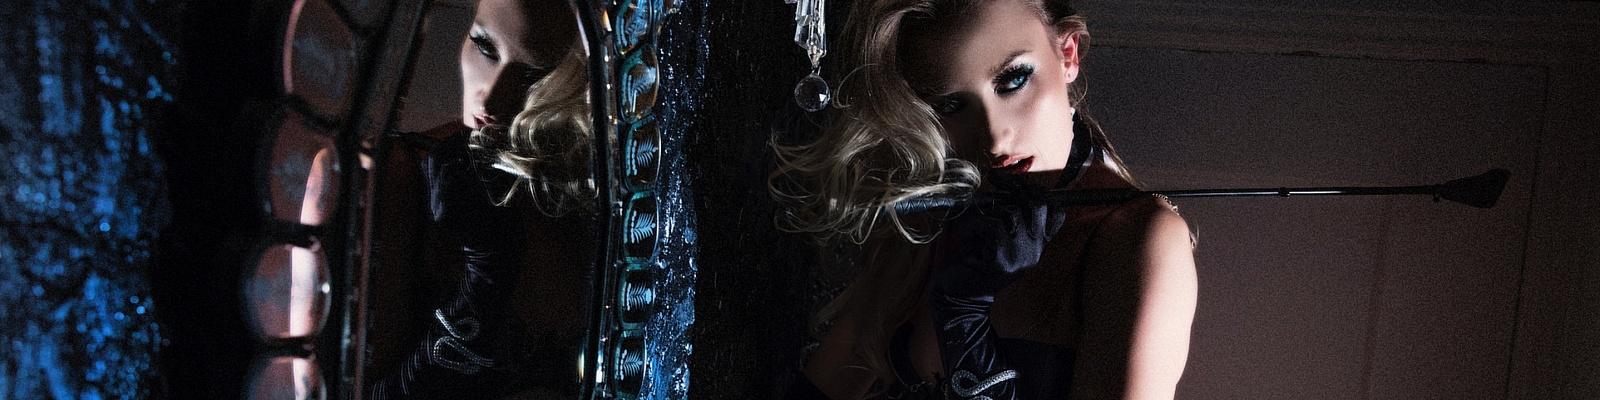 Elle Zelena's Cover Photo